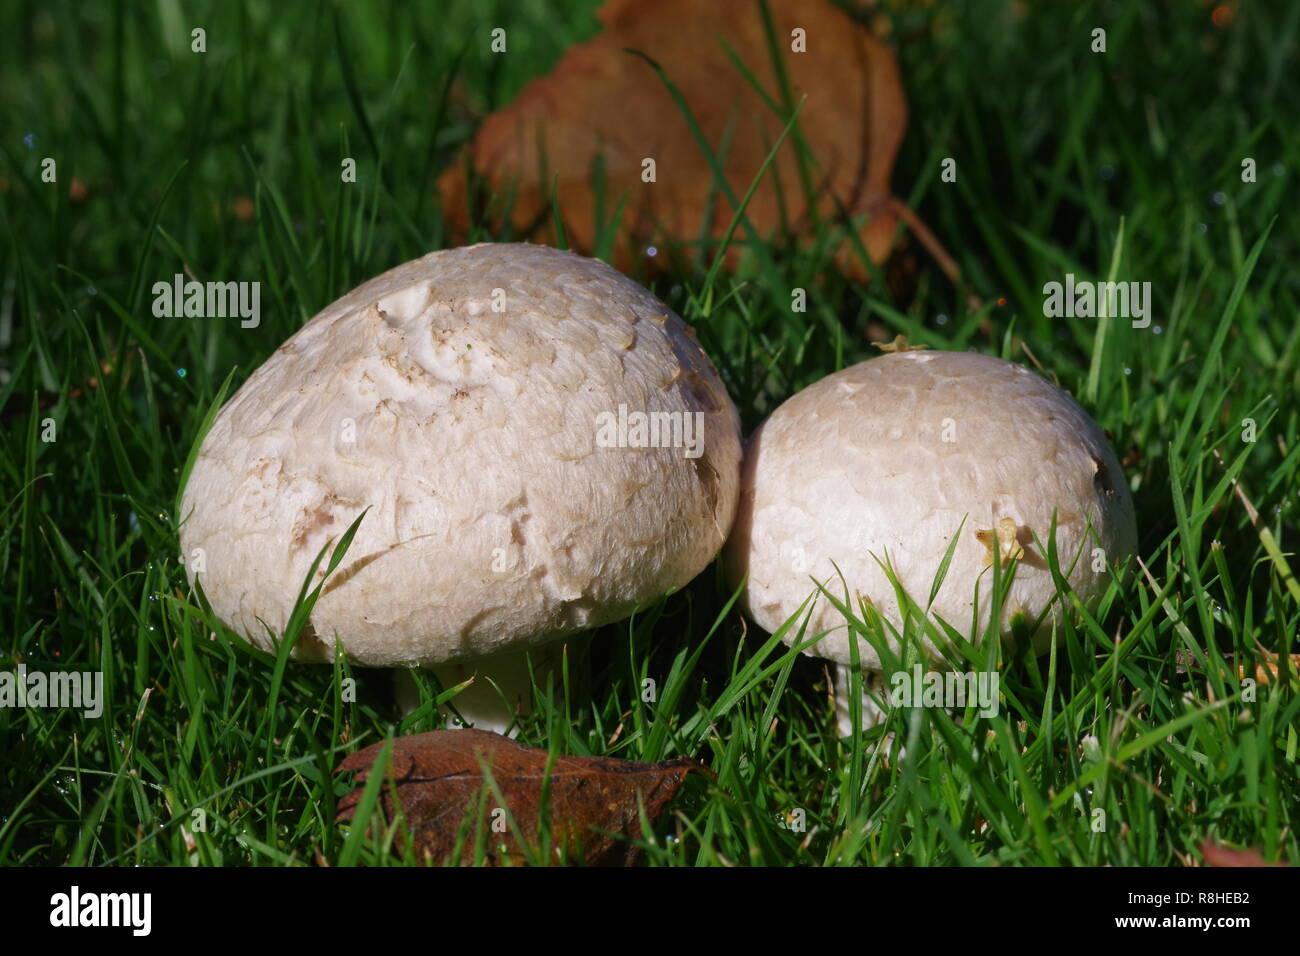 Field Mushroom Pair (Agaricus campestris) Growing on the Lawn at Cruickshank botanic garden. Old Aberdeen, Scotland, UK. Early Autumn, 2018. - Stock Image